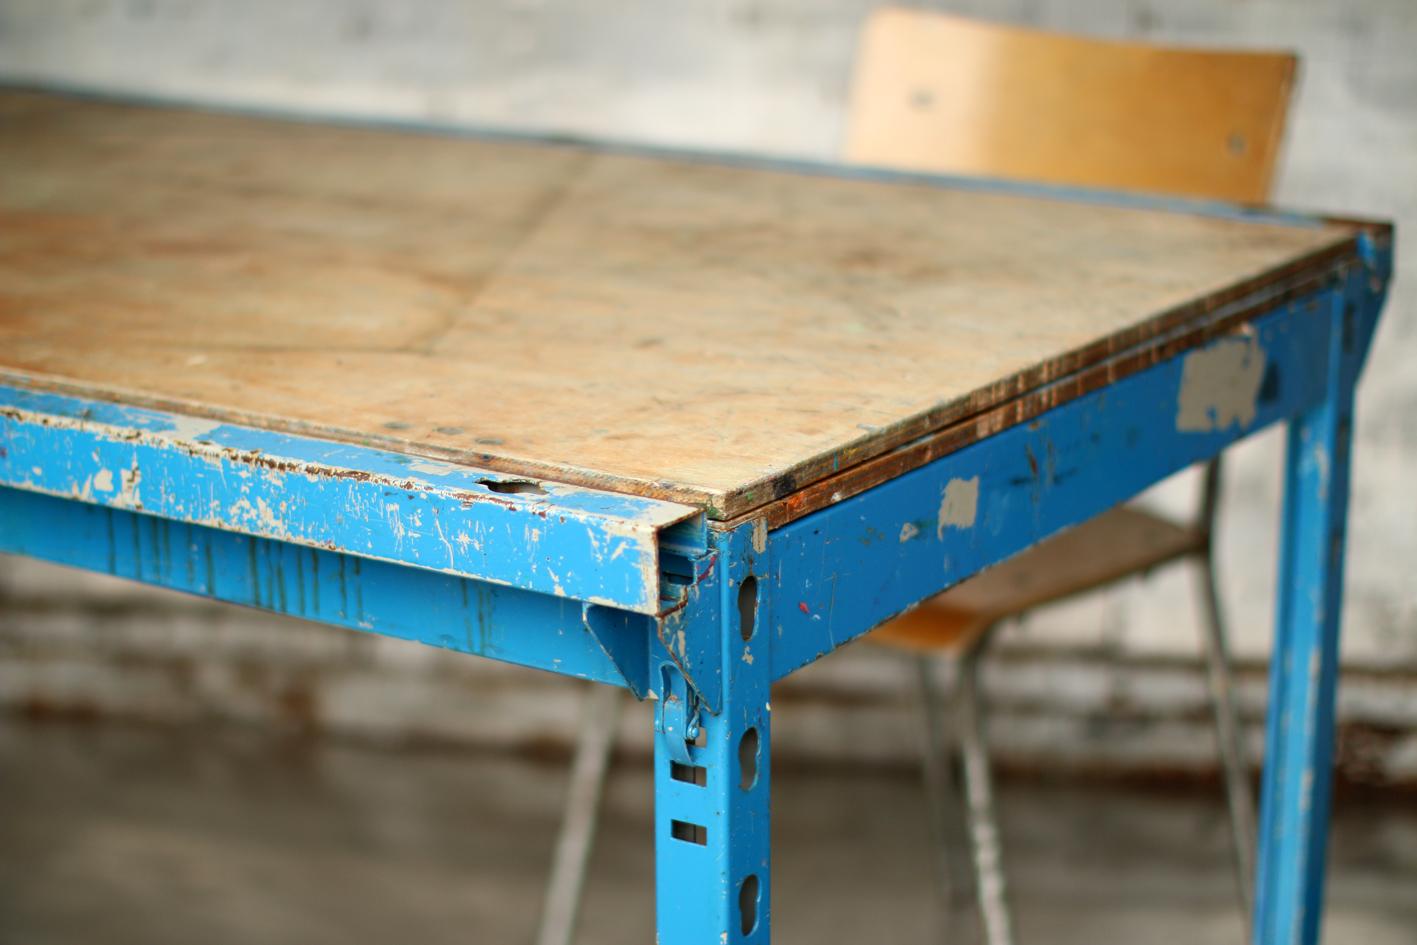 Houten Planken Tafel: Douglas hout per m. Eikenhouten boomstam ...